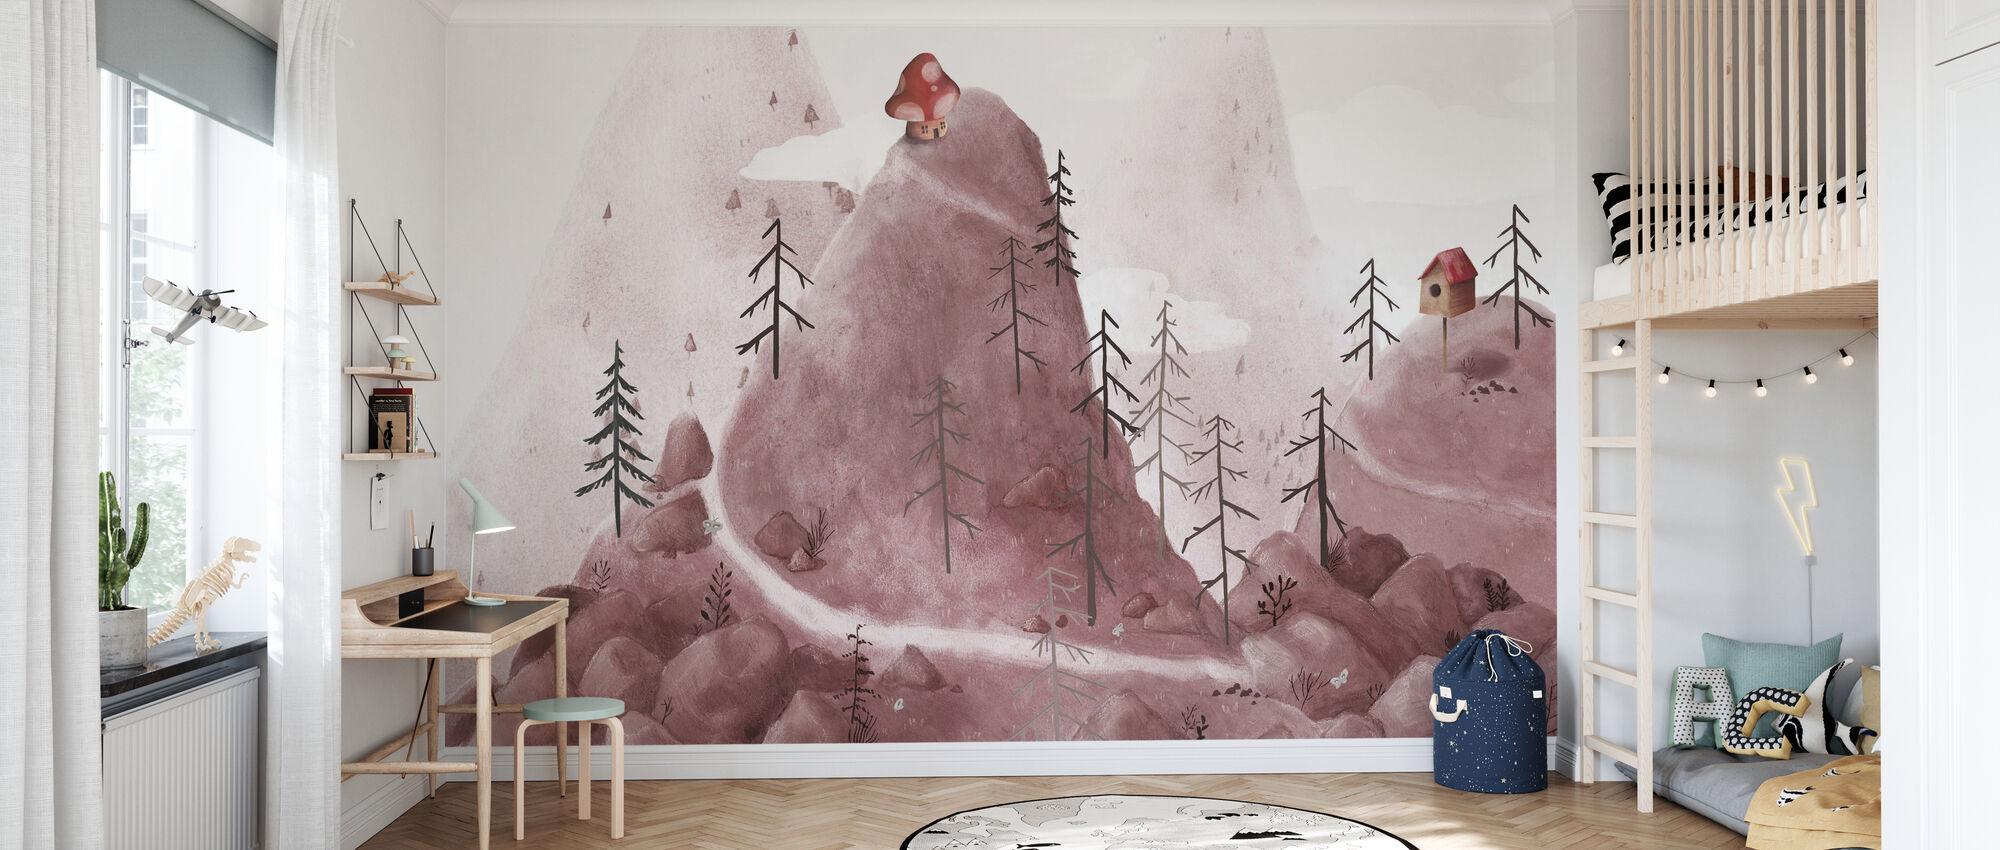 Birdhouse Fantasy Mountains - Wallpaper - Kids Room